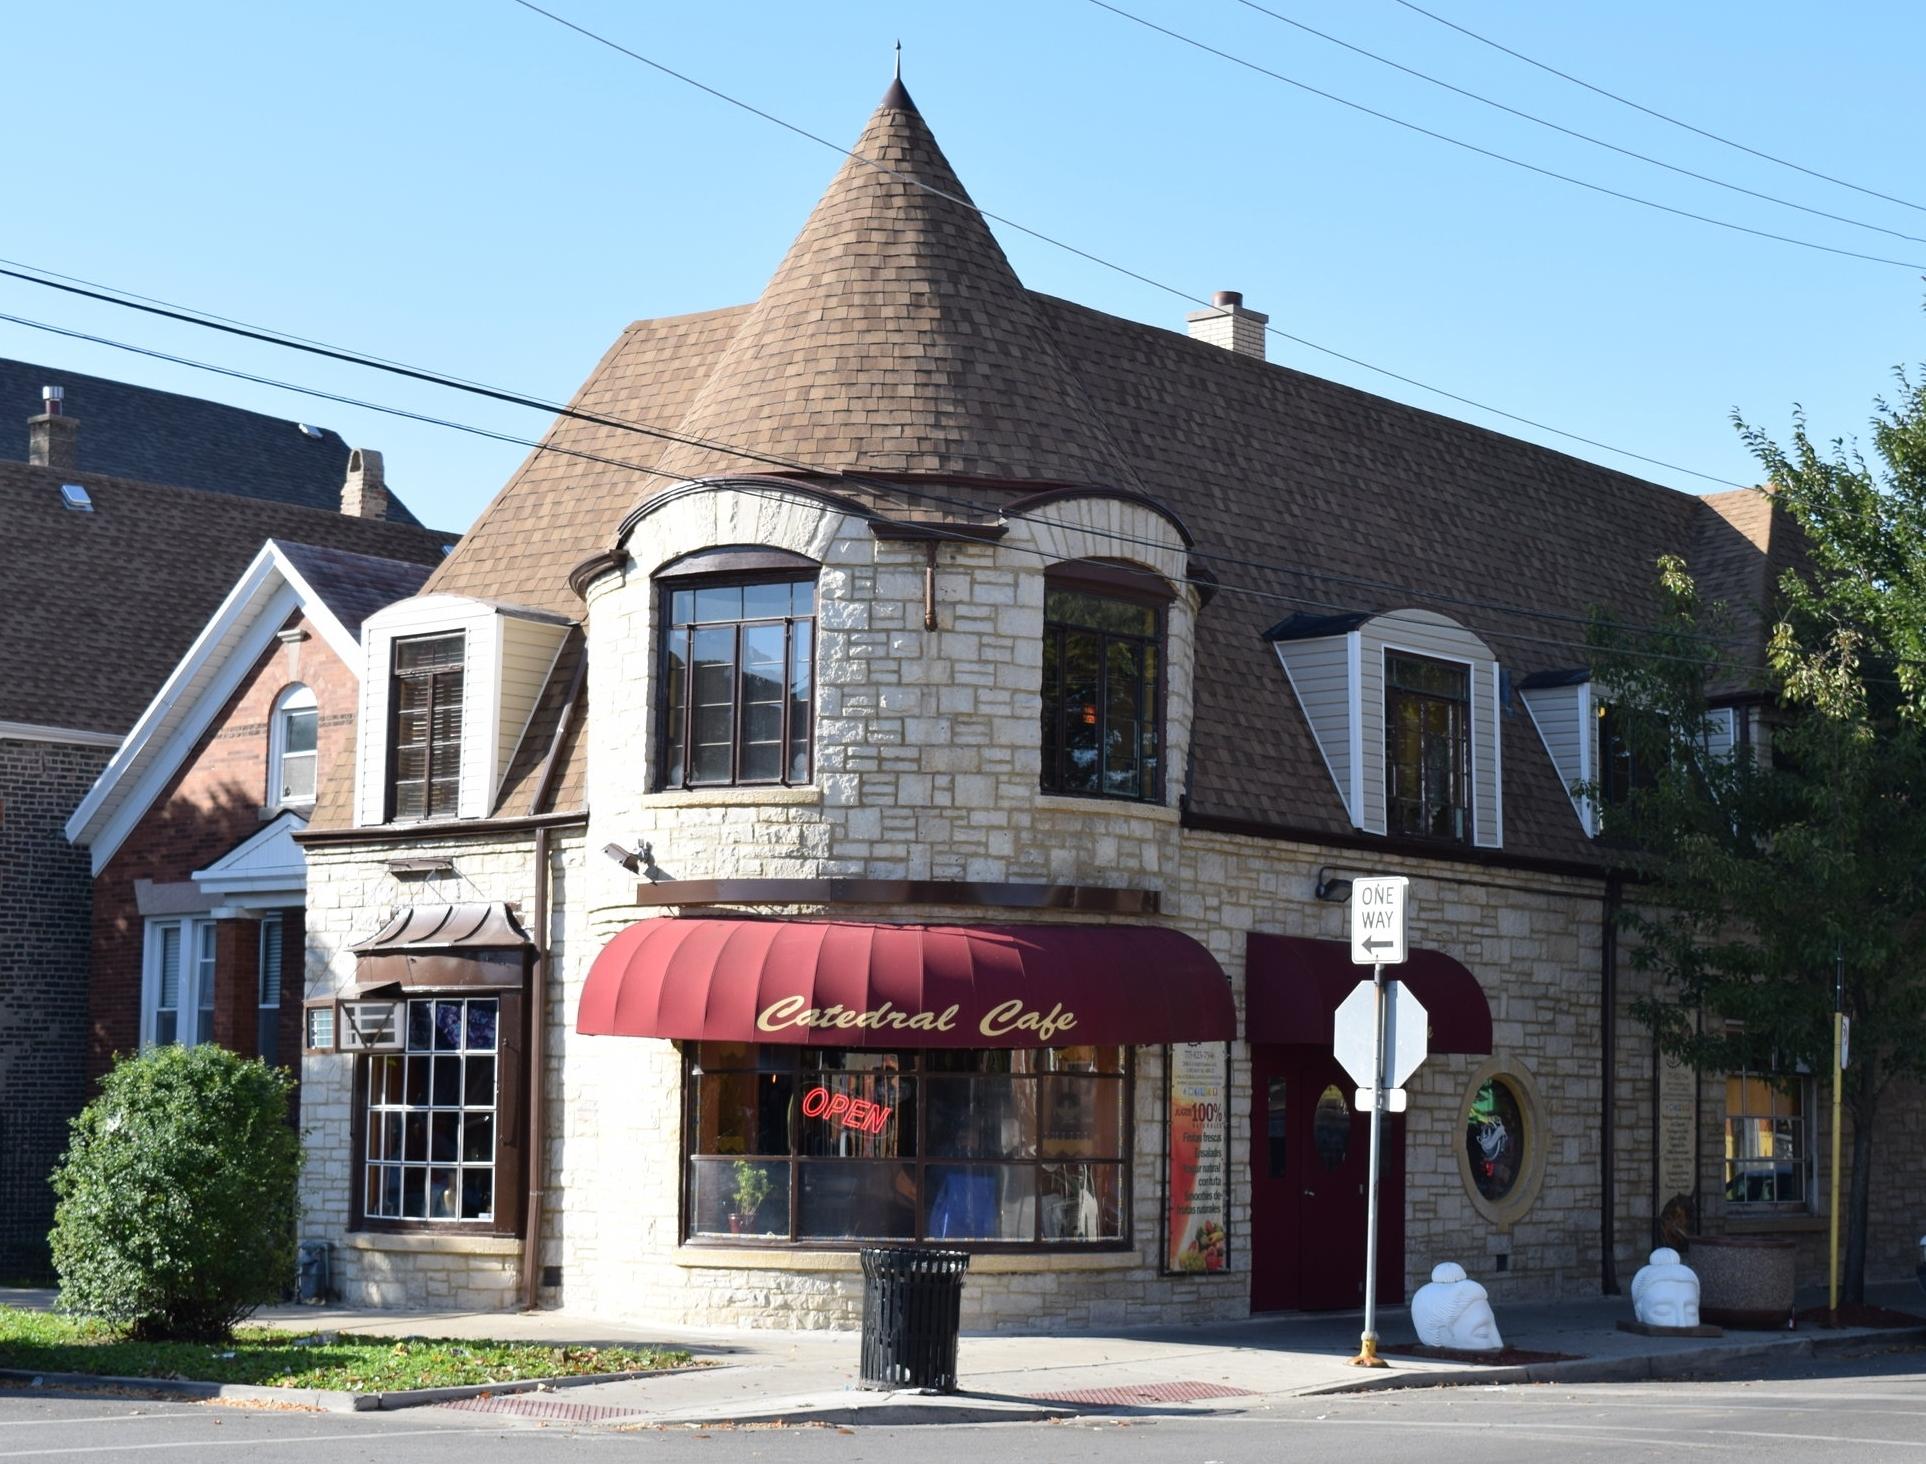 La Catedral Cafe